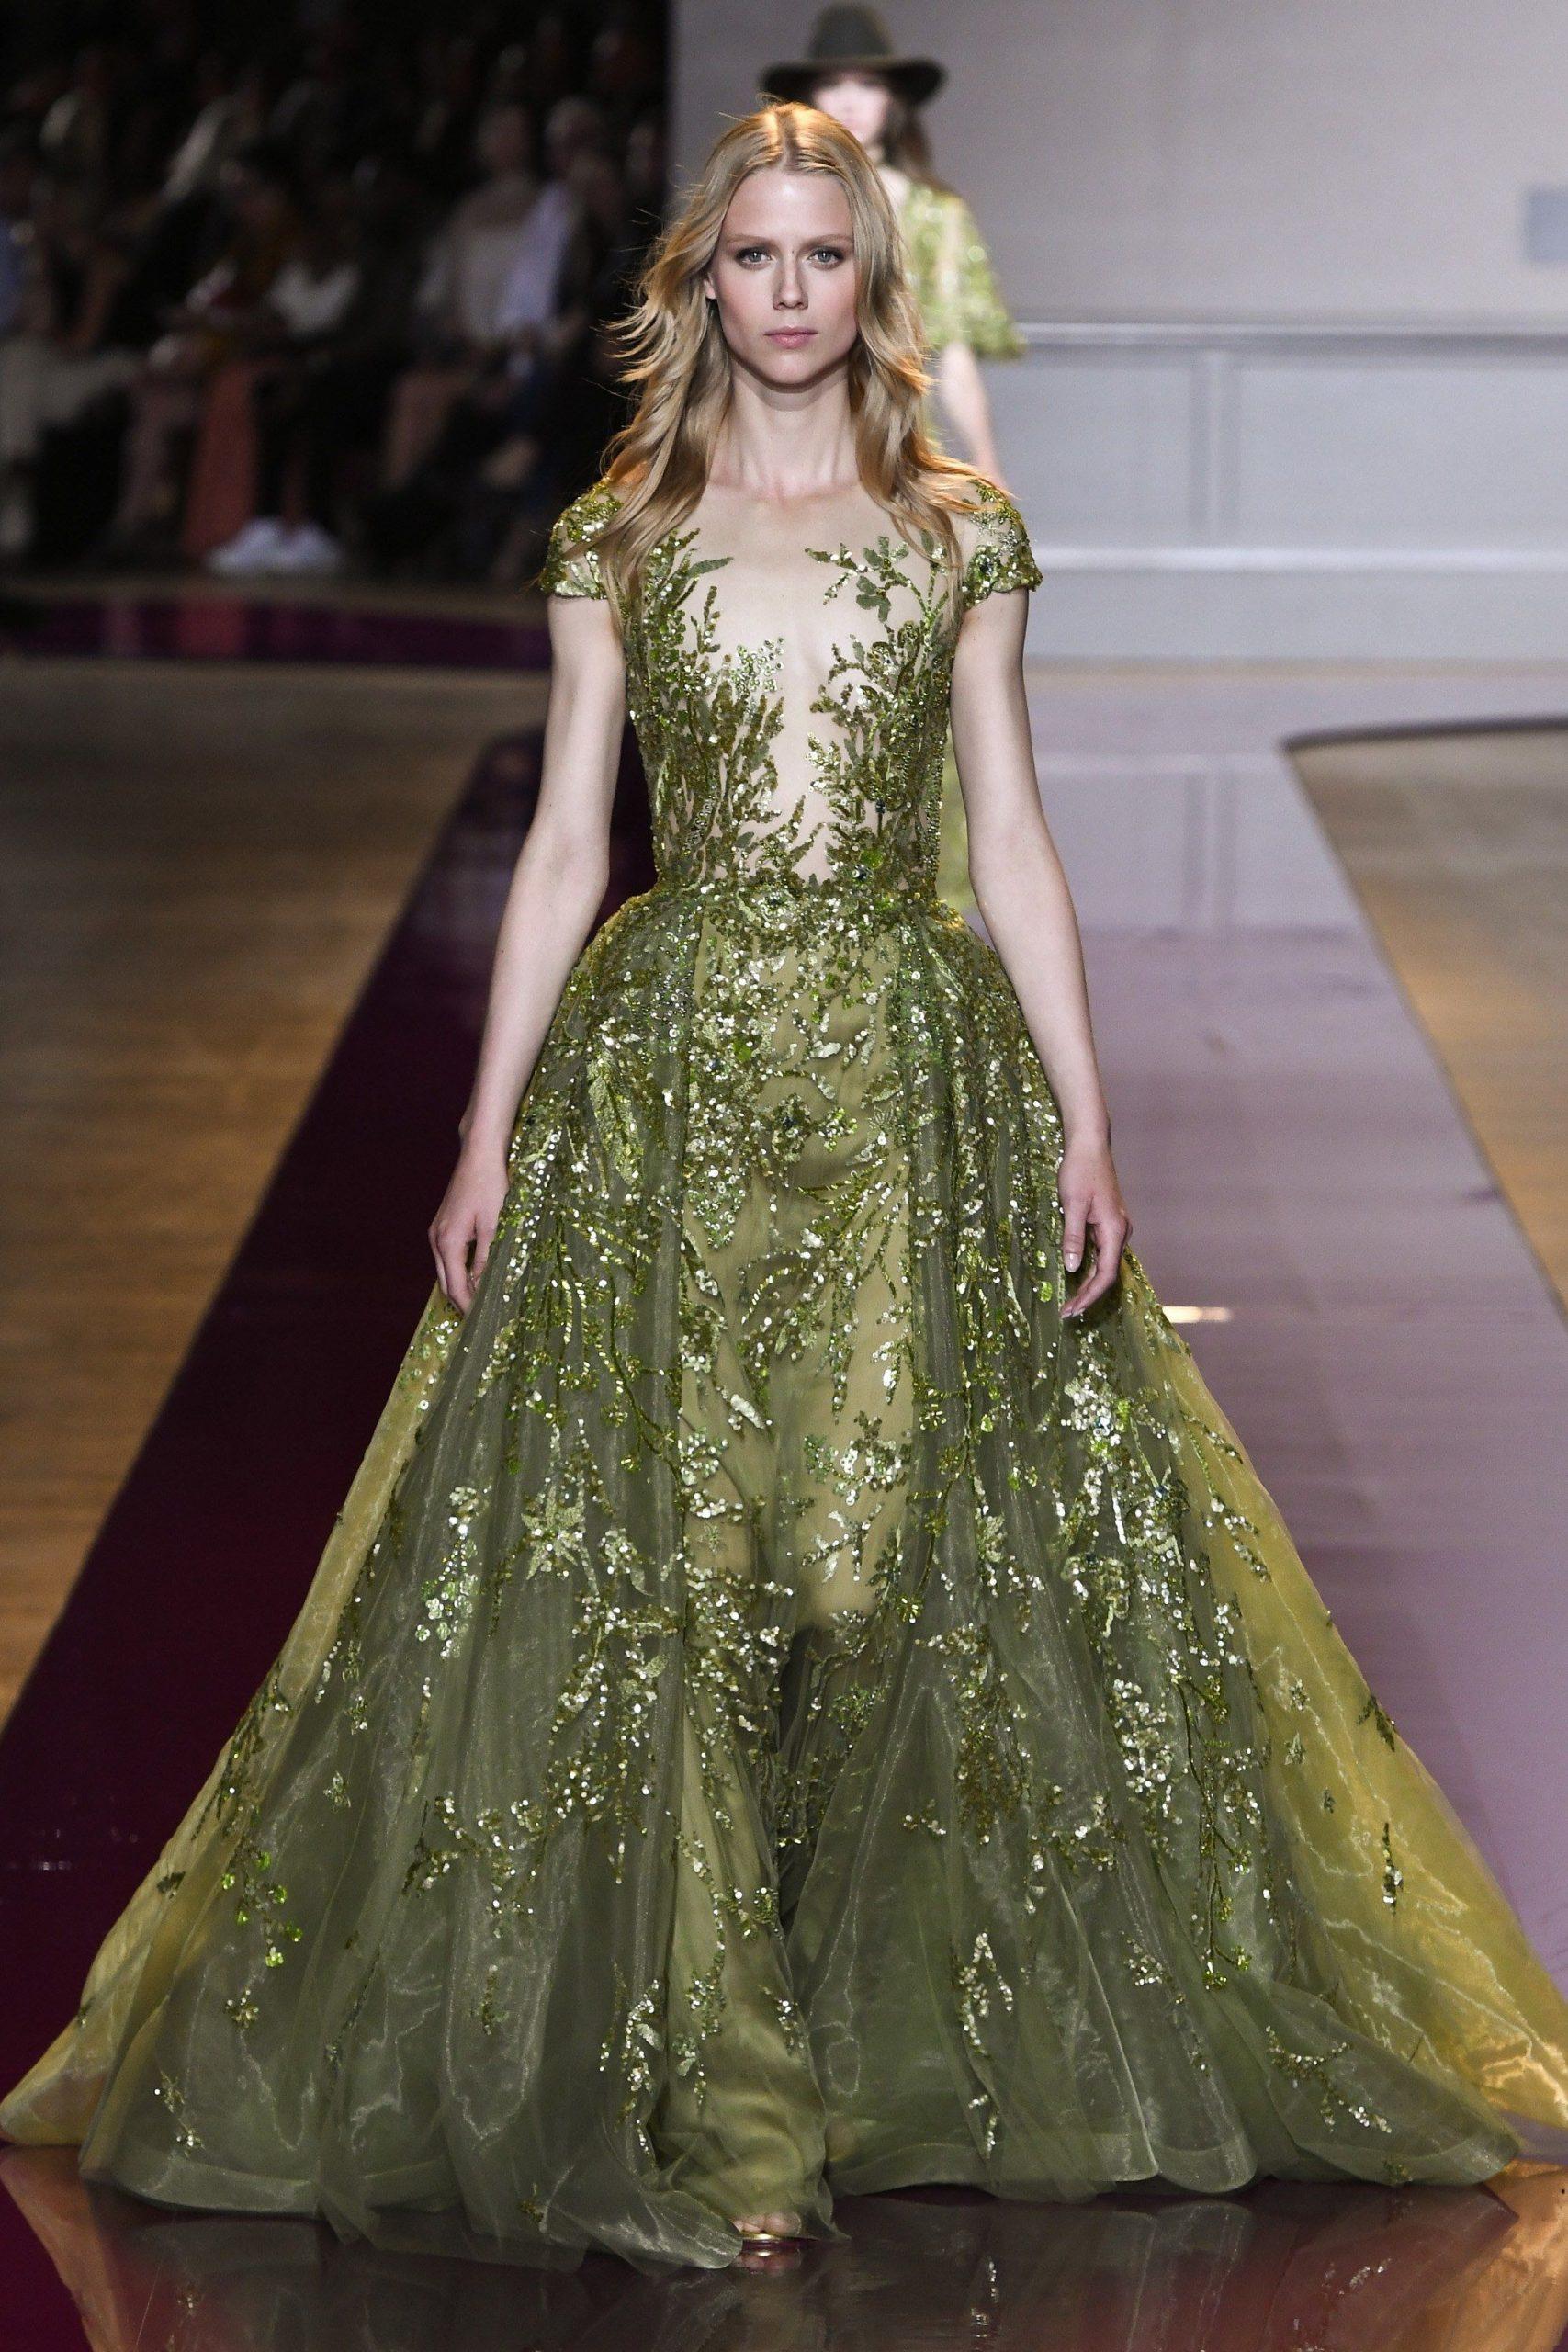 Designer Luxurius Extravagante Abendkleider Boutique17 Leicht Extravagante Abendkleider Vertrieb